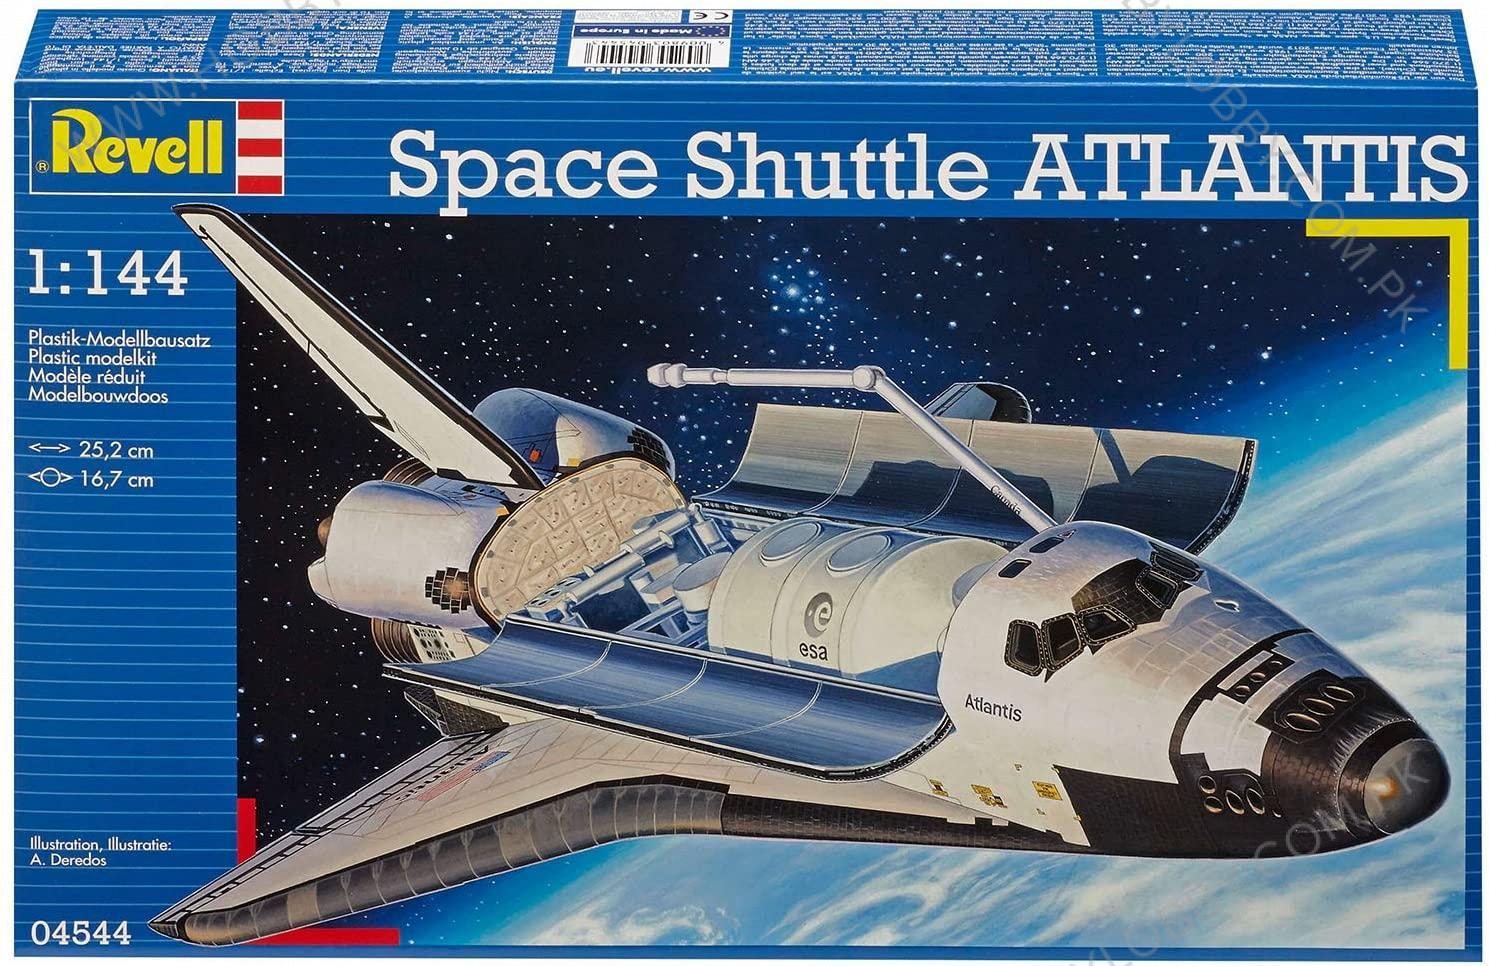 RE 1:144 SPACE SHUTTLE ATLANTIS